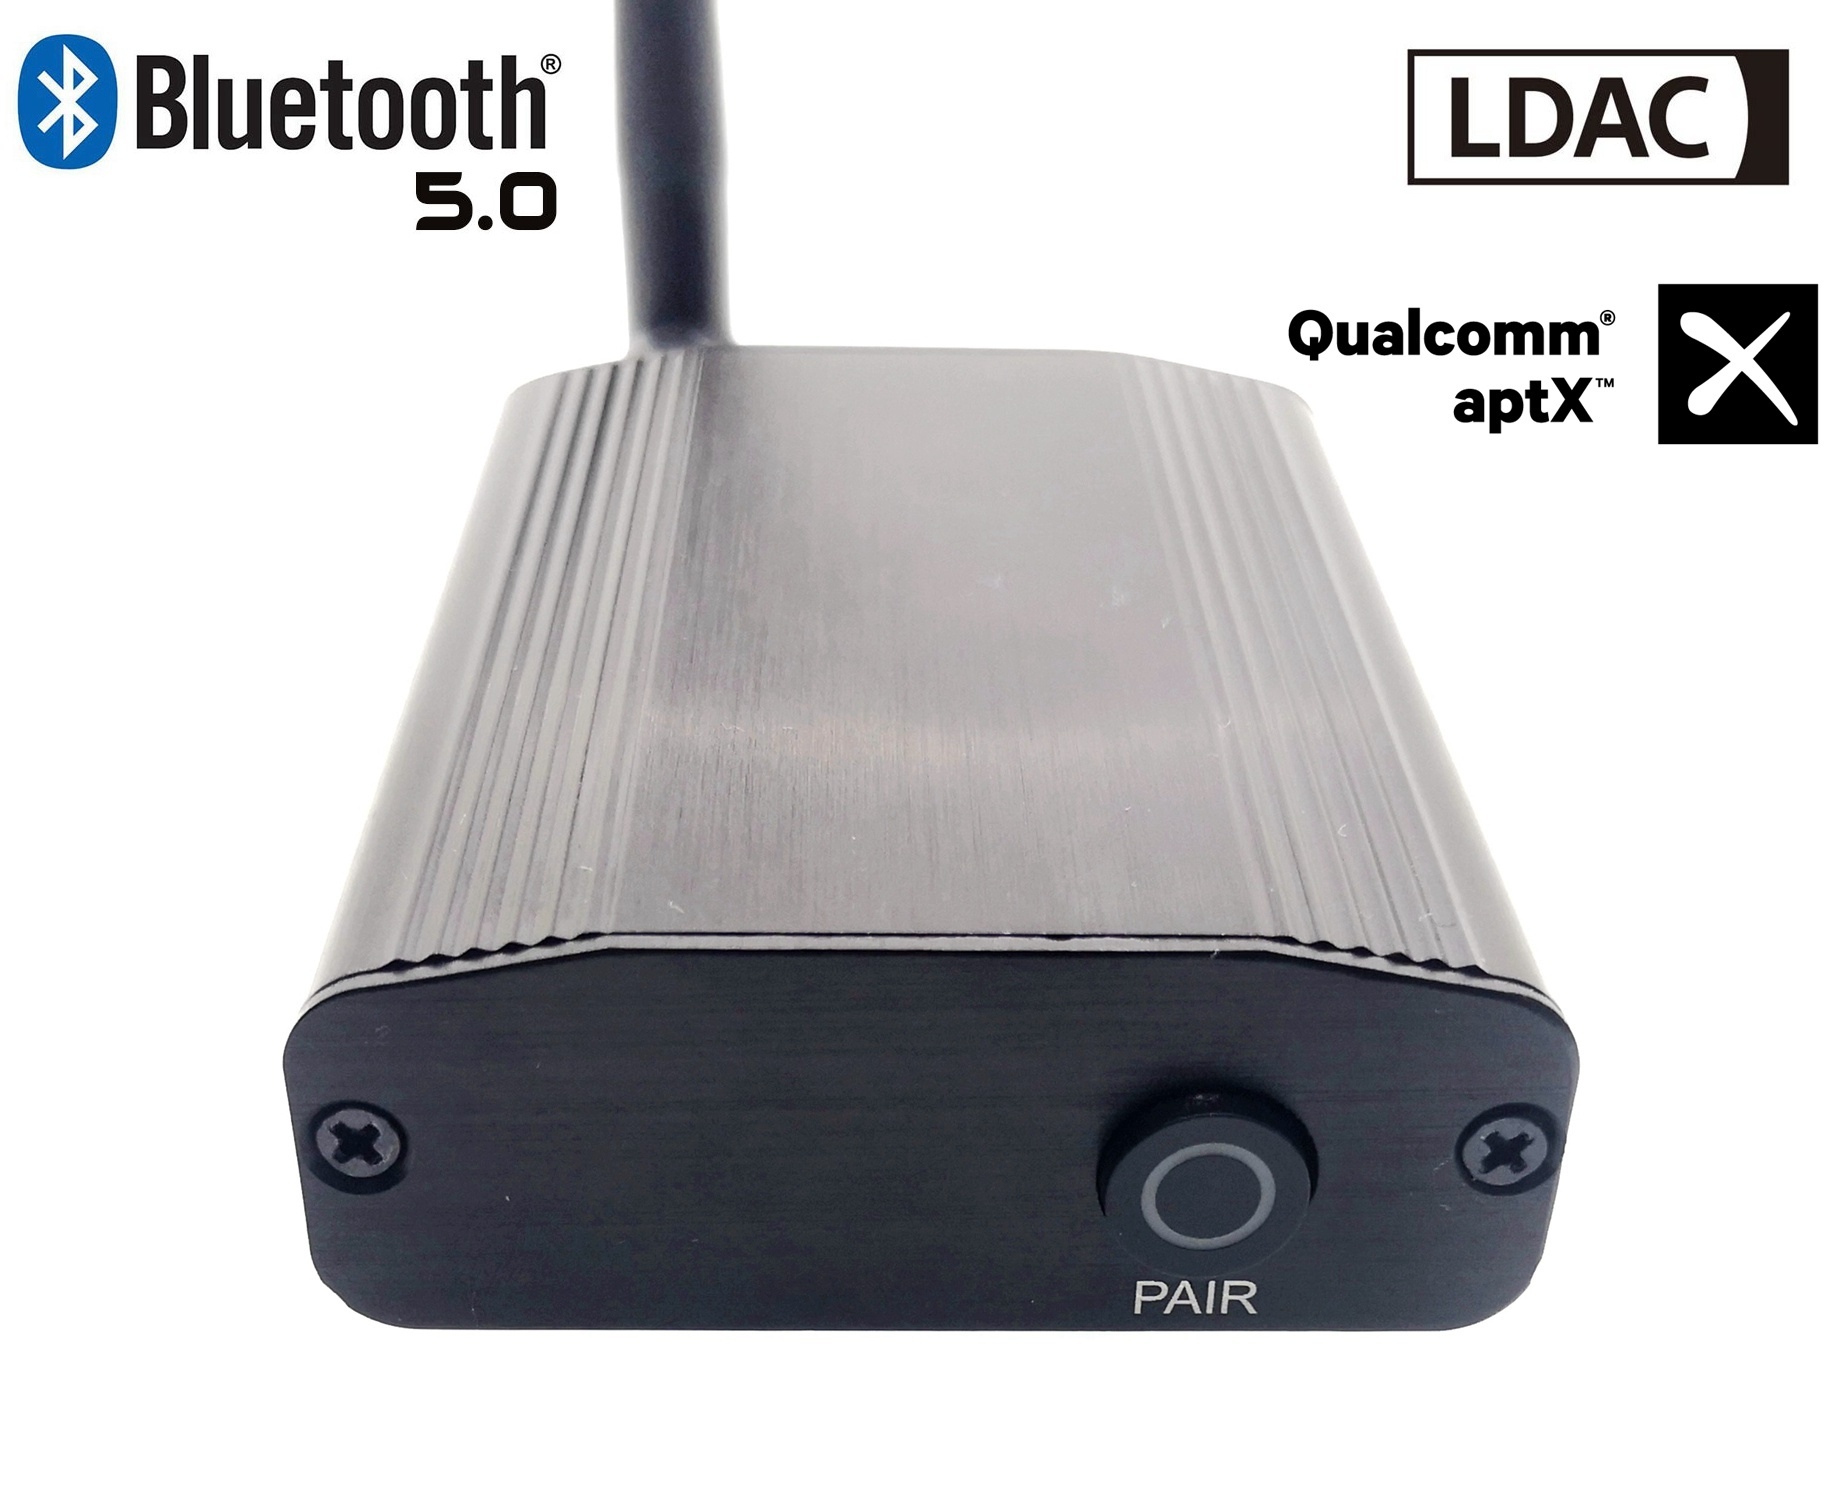 LDAC50 CSR8675-V5.0 Bluetooth LDAC aptx zu 24bit/96khz Koaxial Optical Digital Audio Bluetooth Audio Receiver Bluetooth 5,0